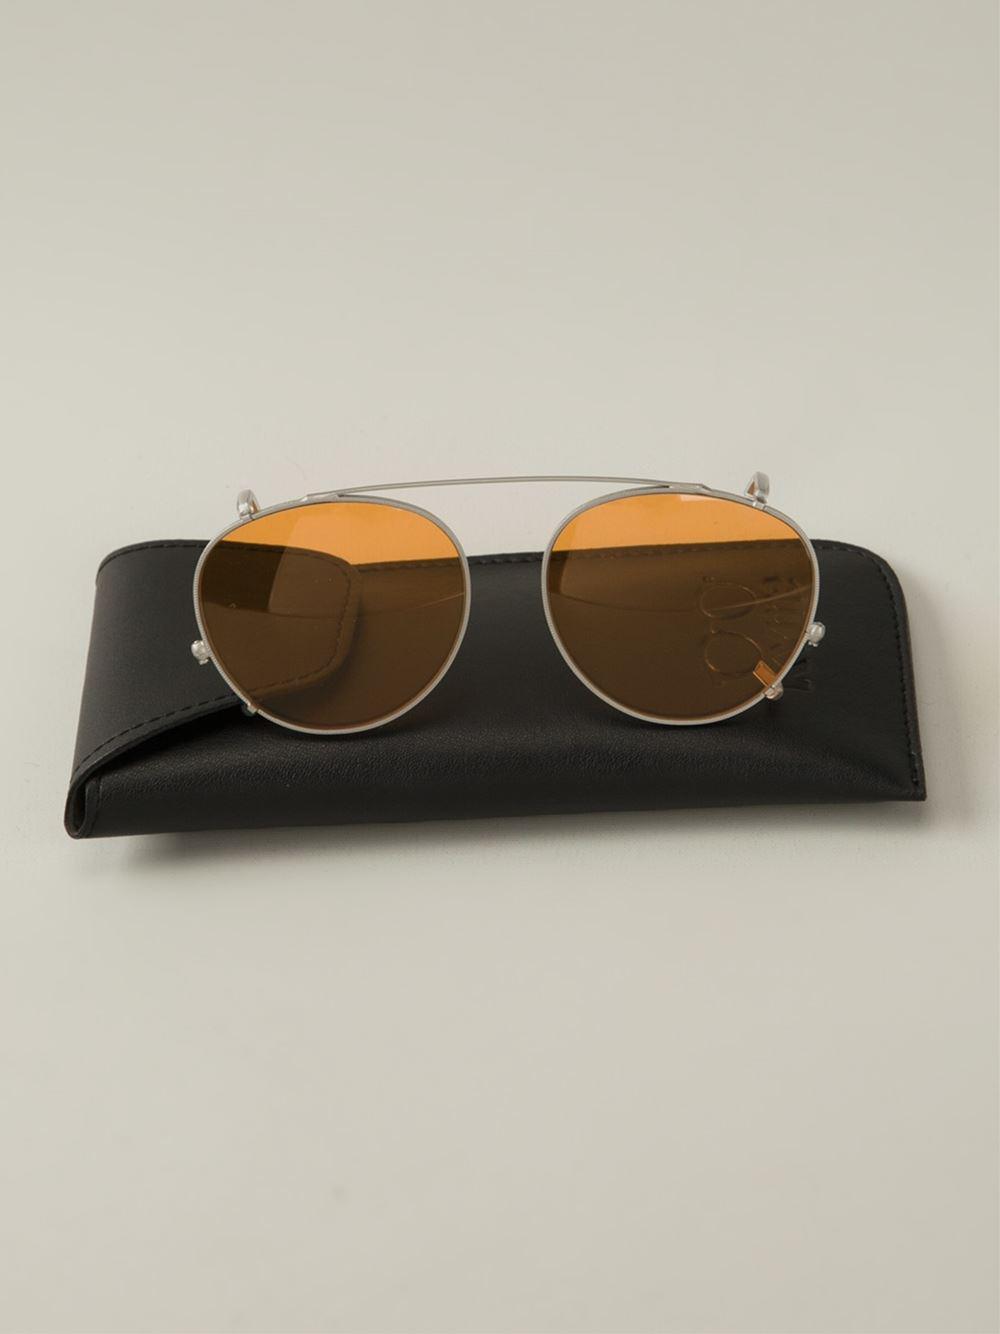 Kyme 'clip On Miki' Sunglasses in Yellow & Orange (Metallic)